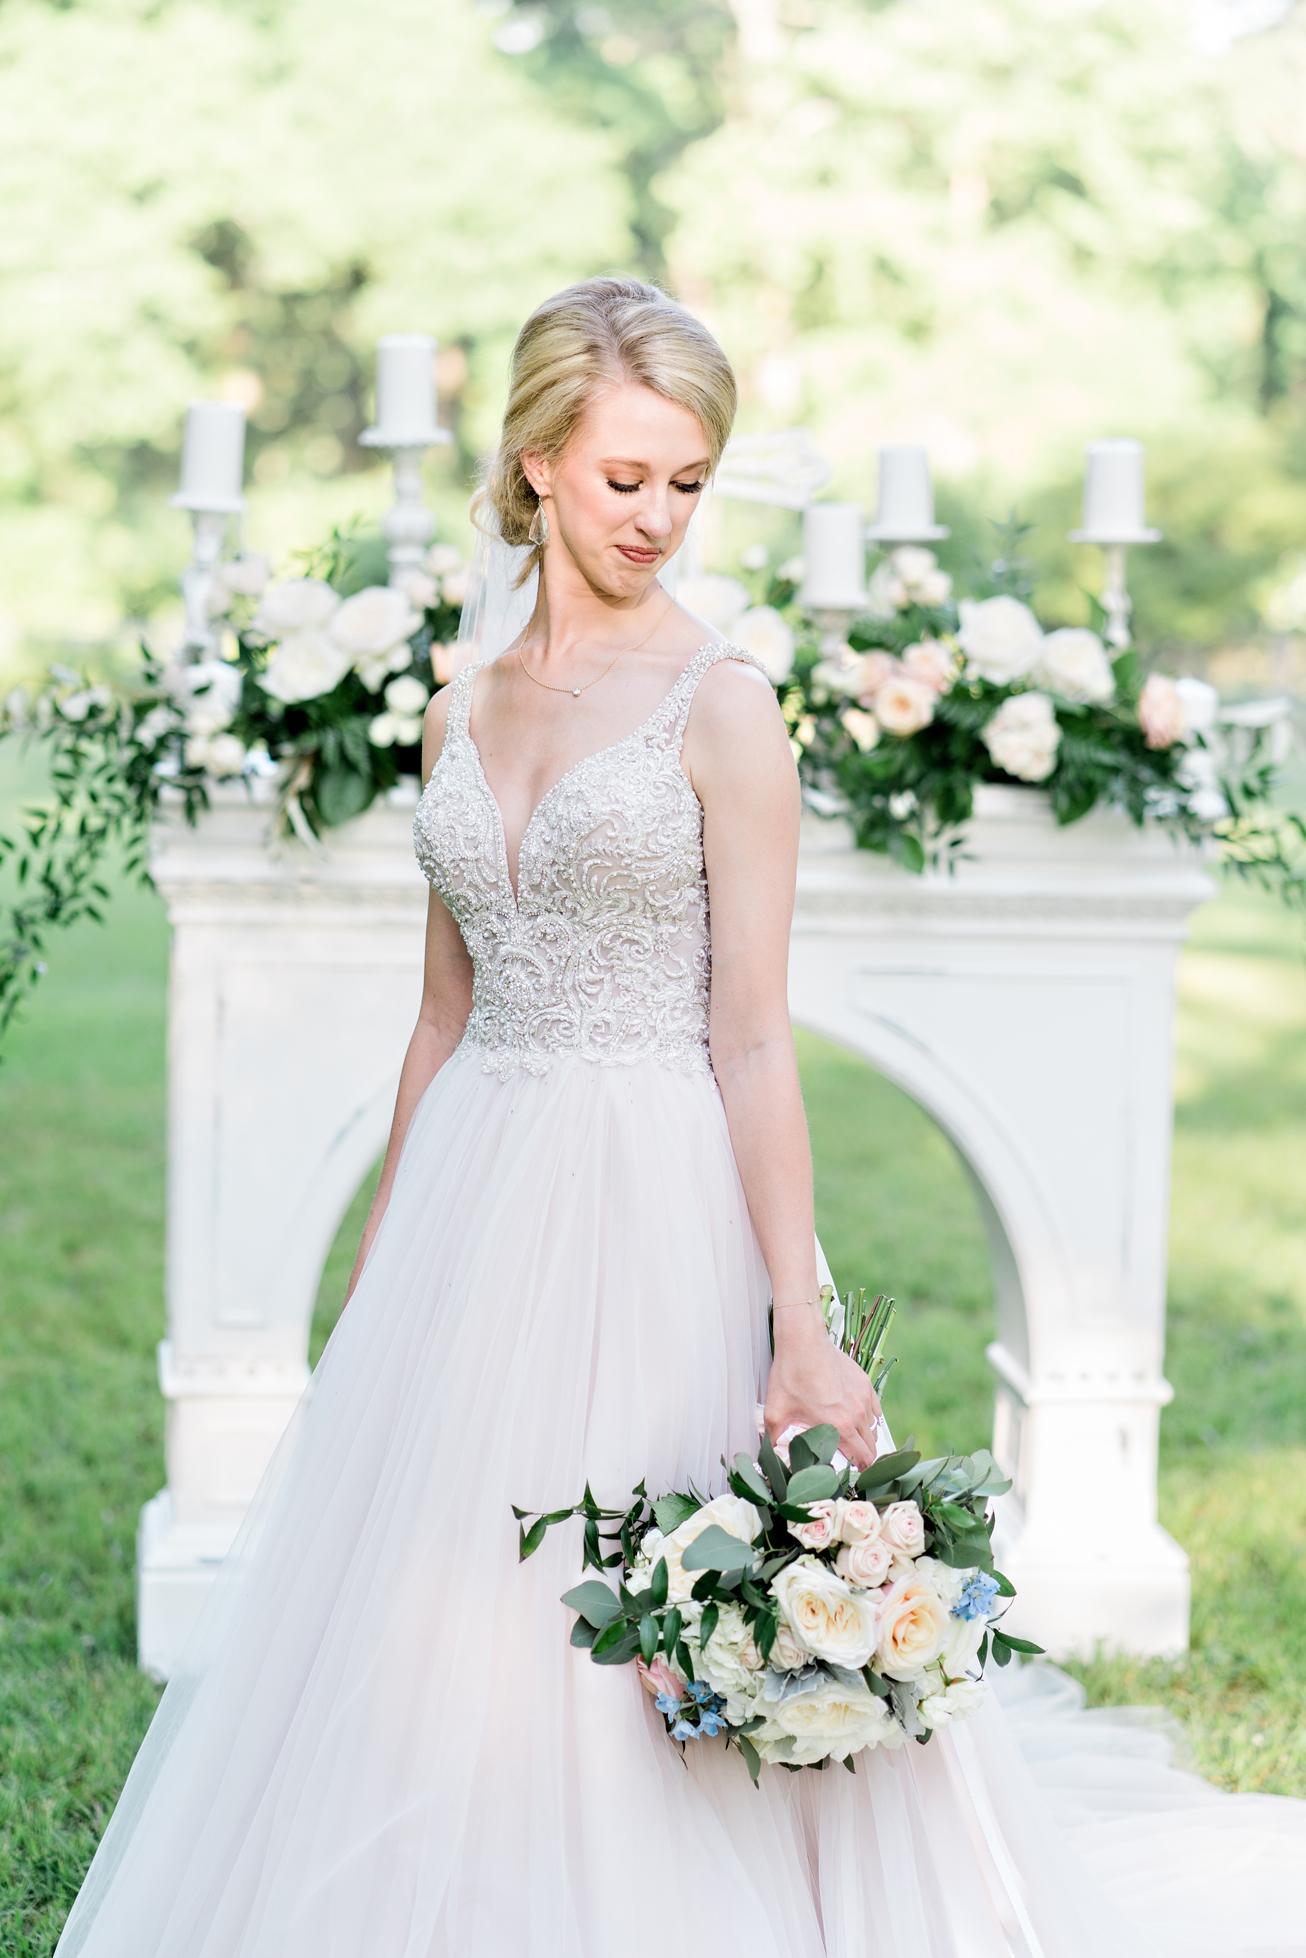 Alabama-Photographers-Nick-Drollette-Wedding-Photography-150.jpg